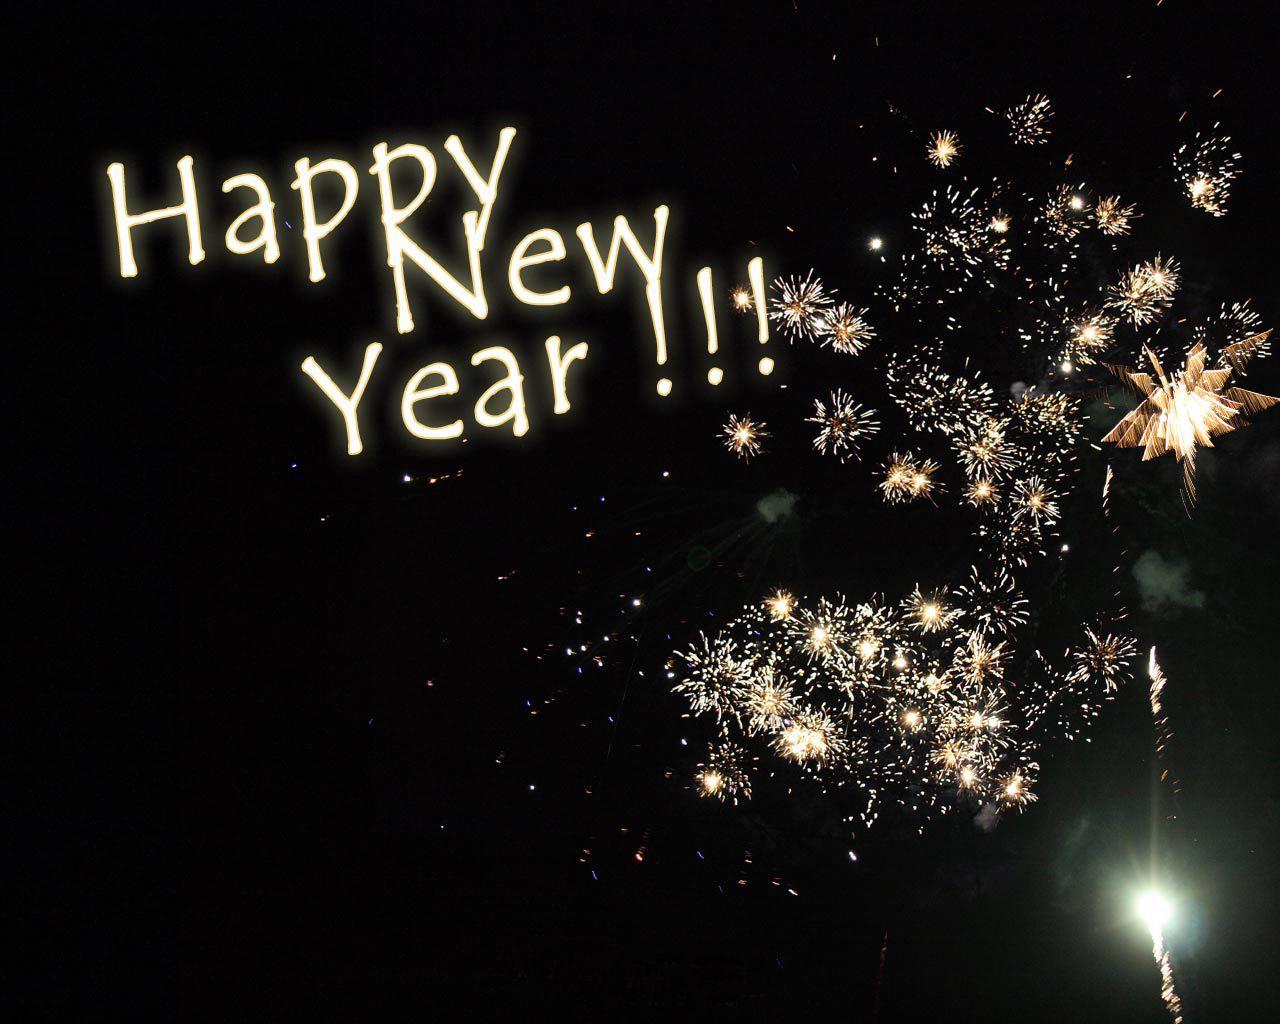 Happy New Year Happy New Year Images Happy New Year Wallpaper New Year Wallpaper